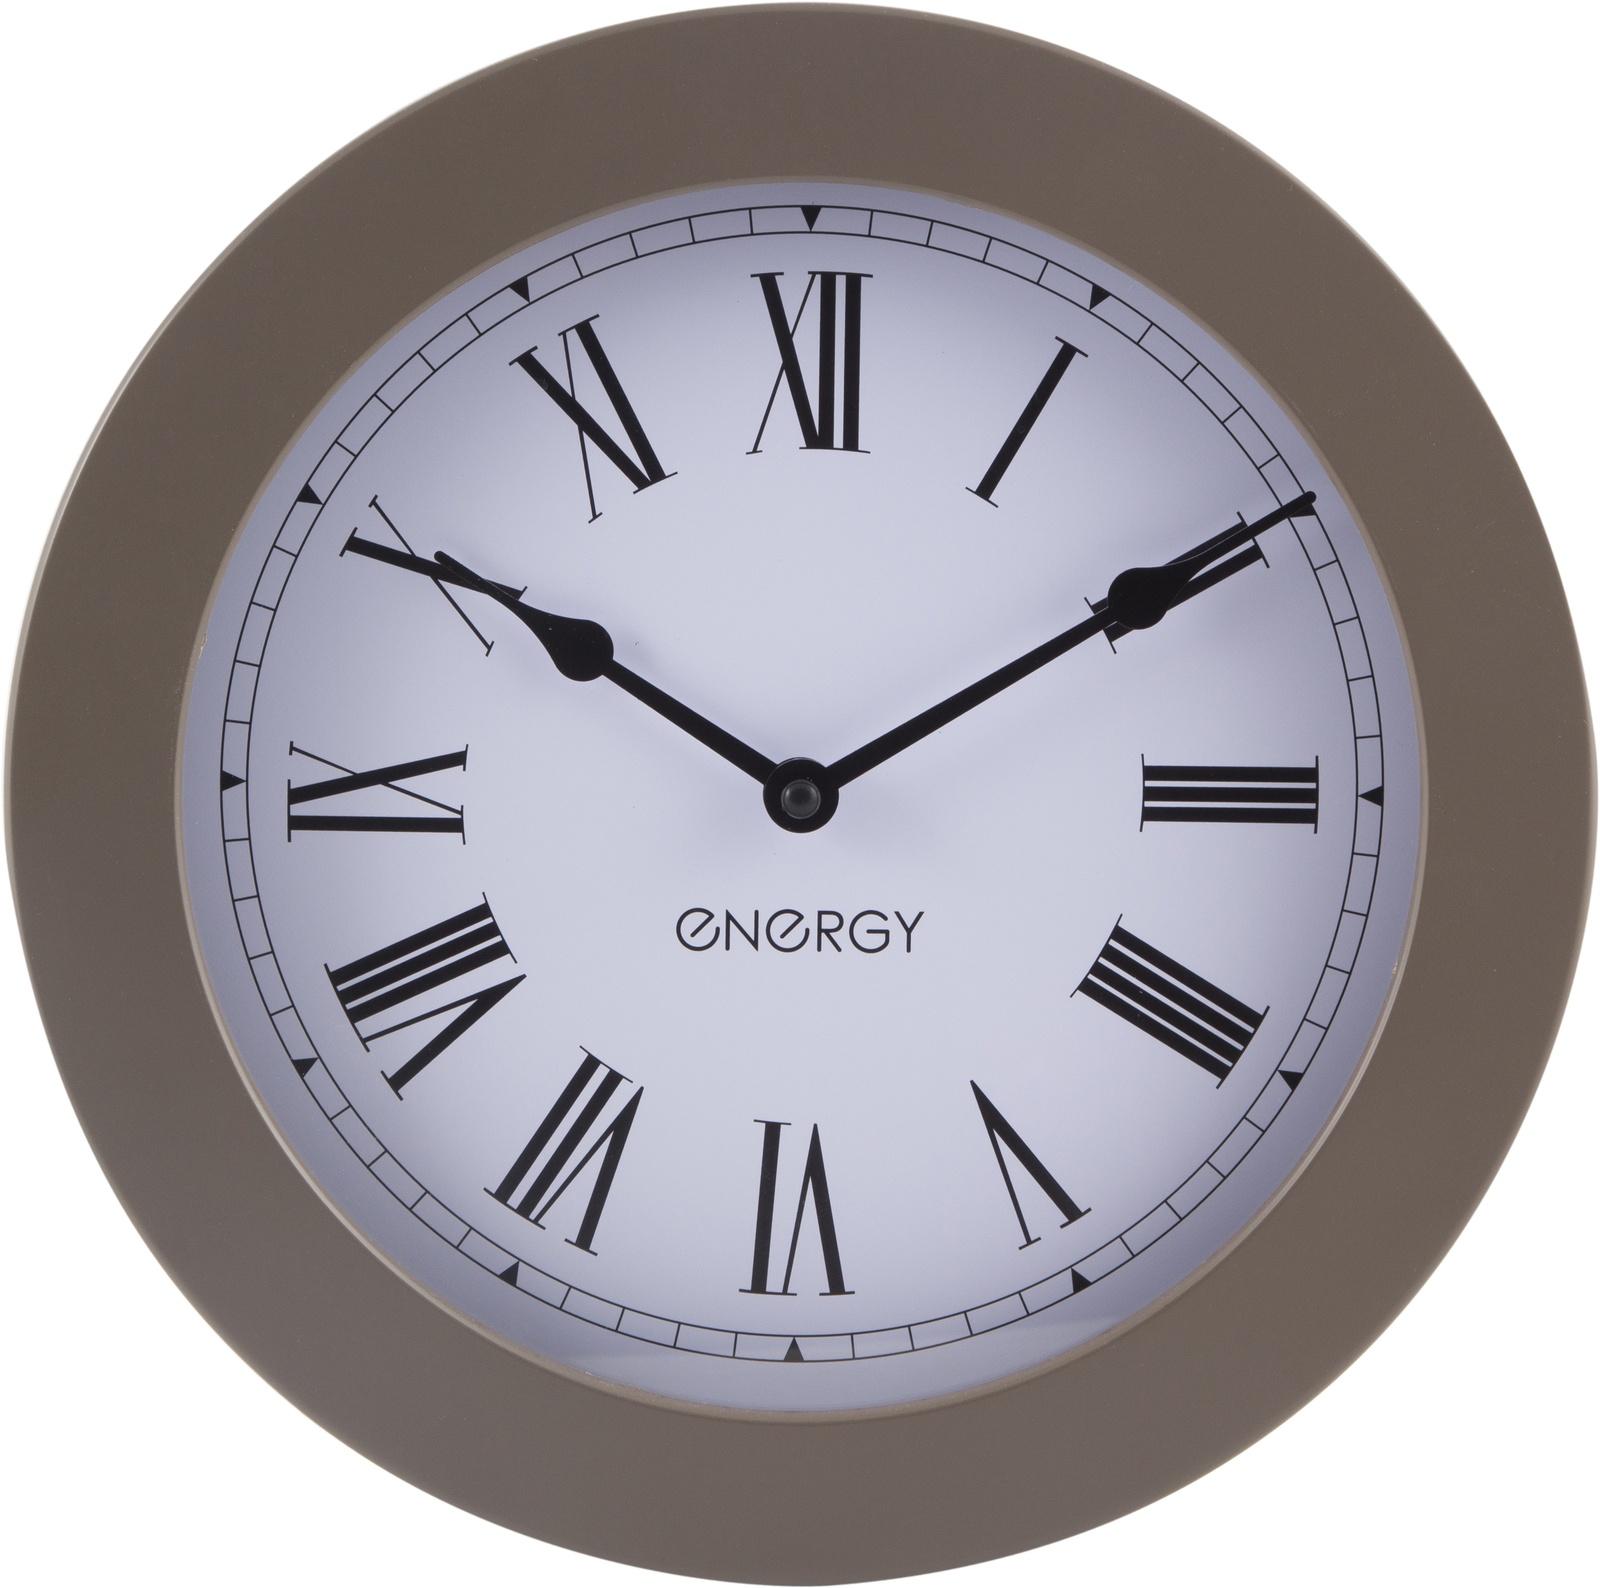 Настенные часы Energy ЕС-114, круглые, золото